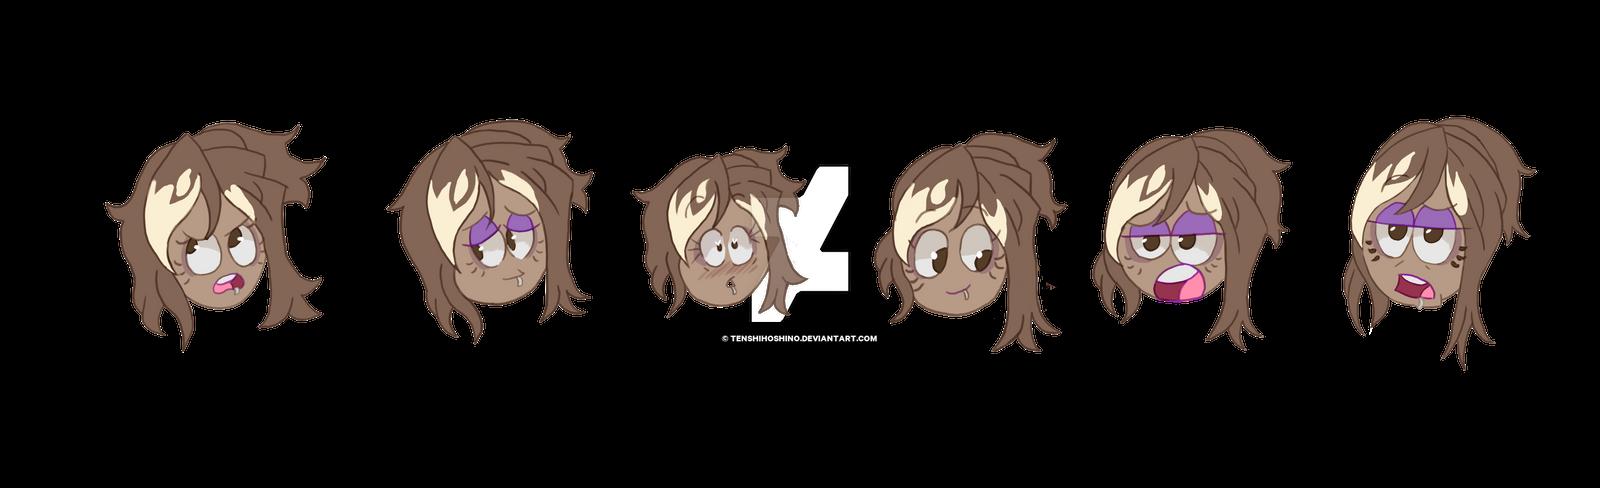 Selena Cartoony expressions by TenshiHoshino